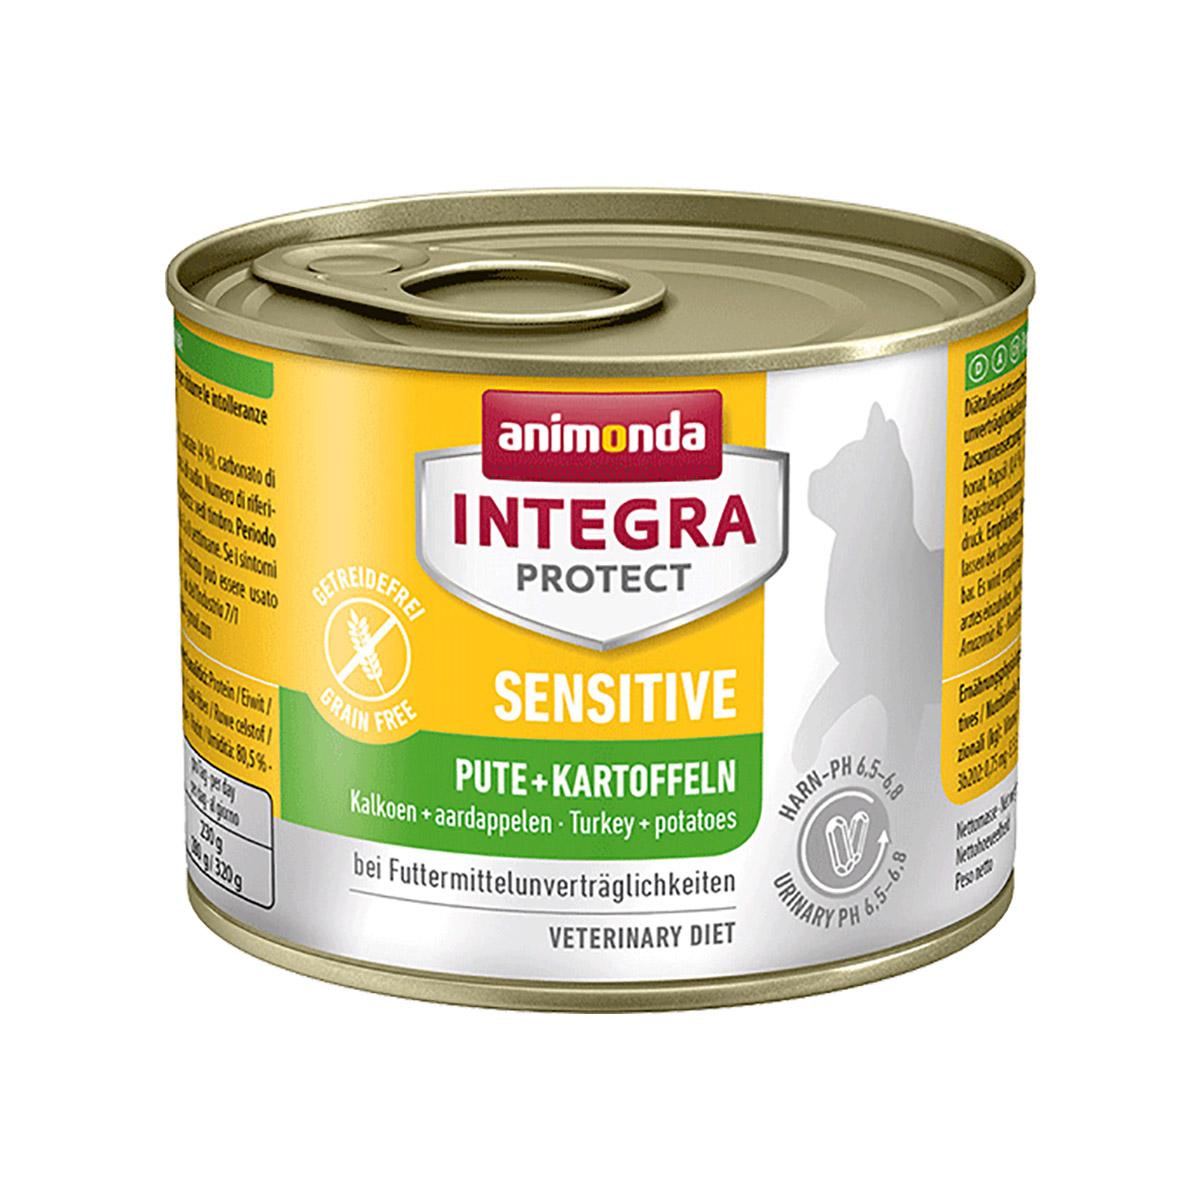 animonda integra protect katzenfutter sensitive pute und kartoffel. Black Bedroom Furniture Sets. Home Design Ideas